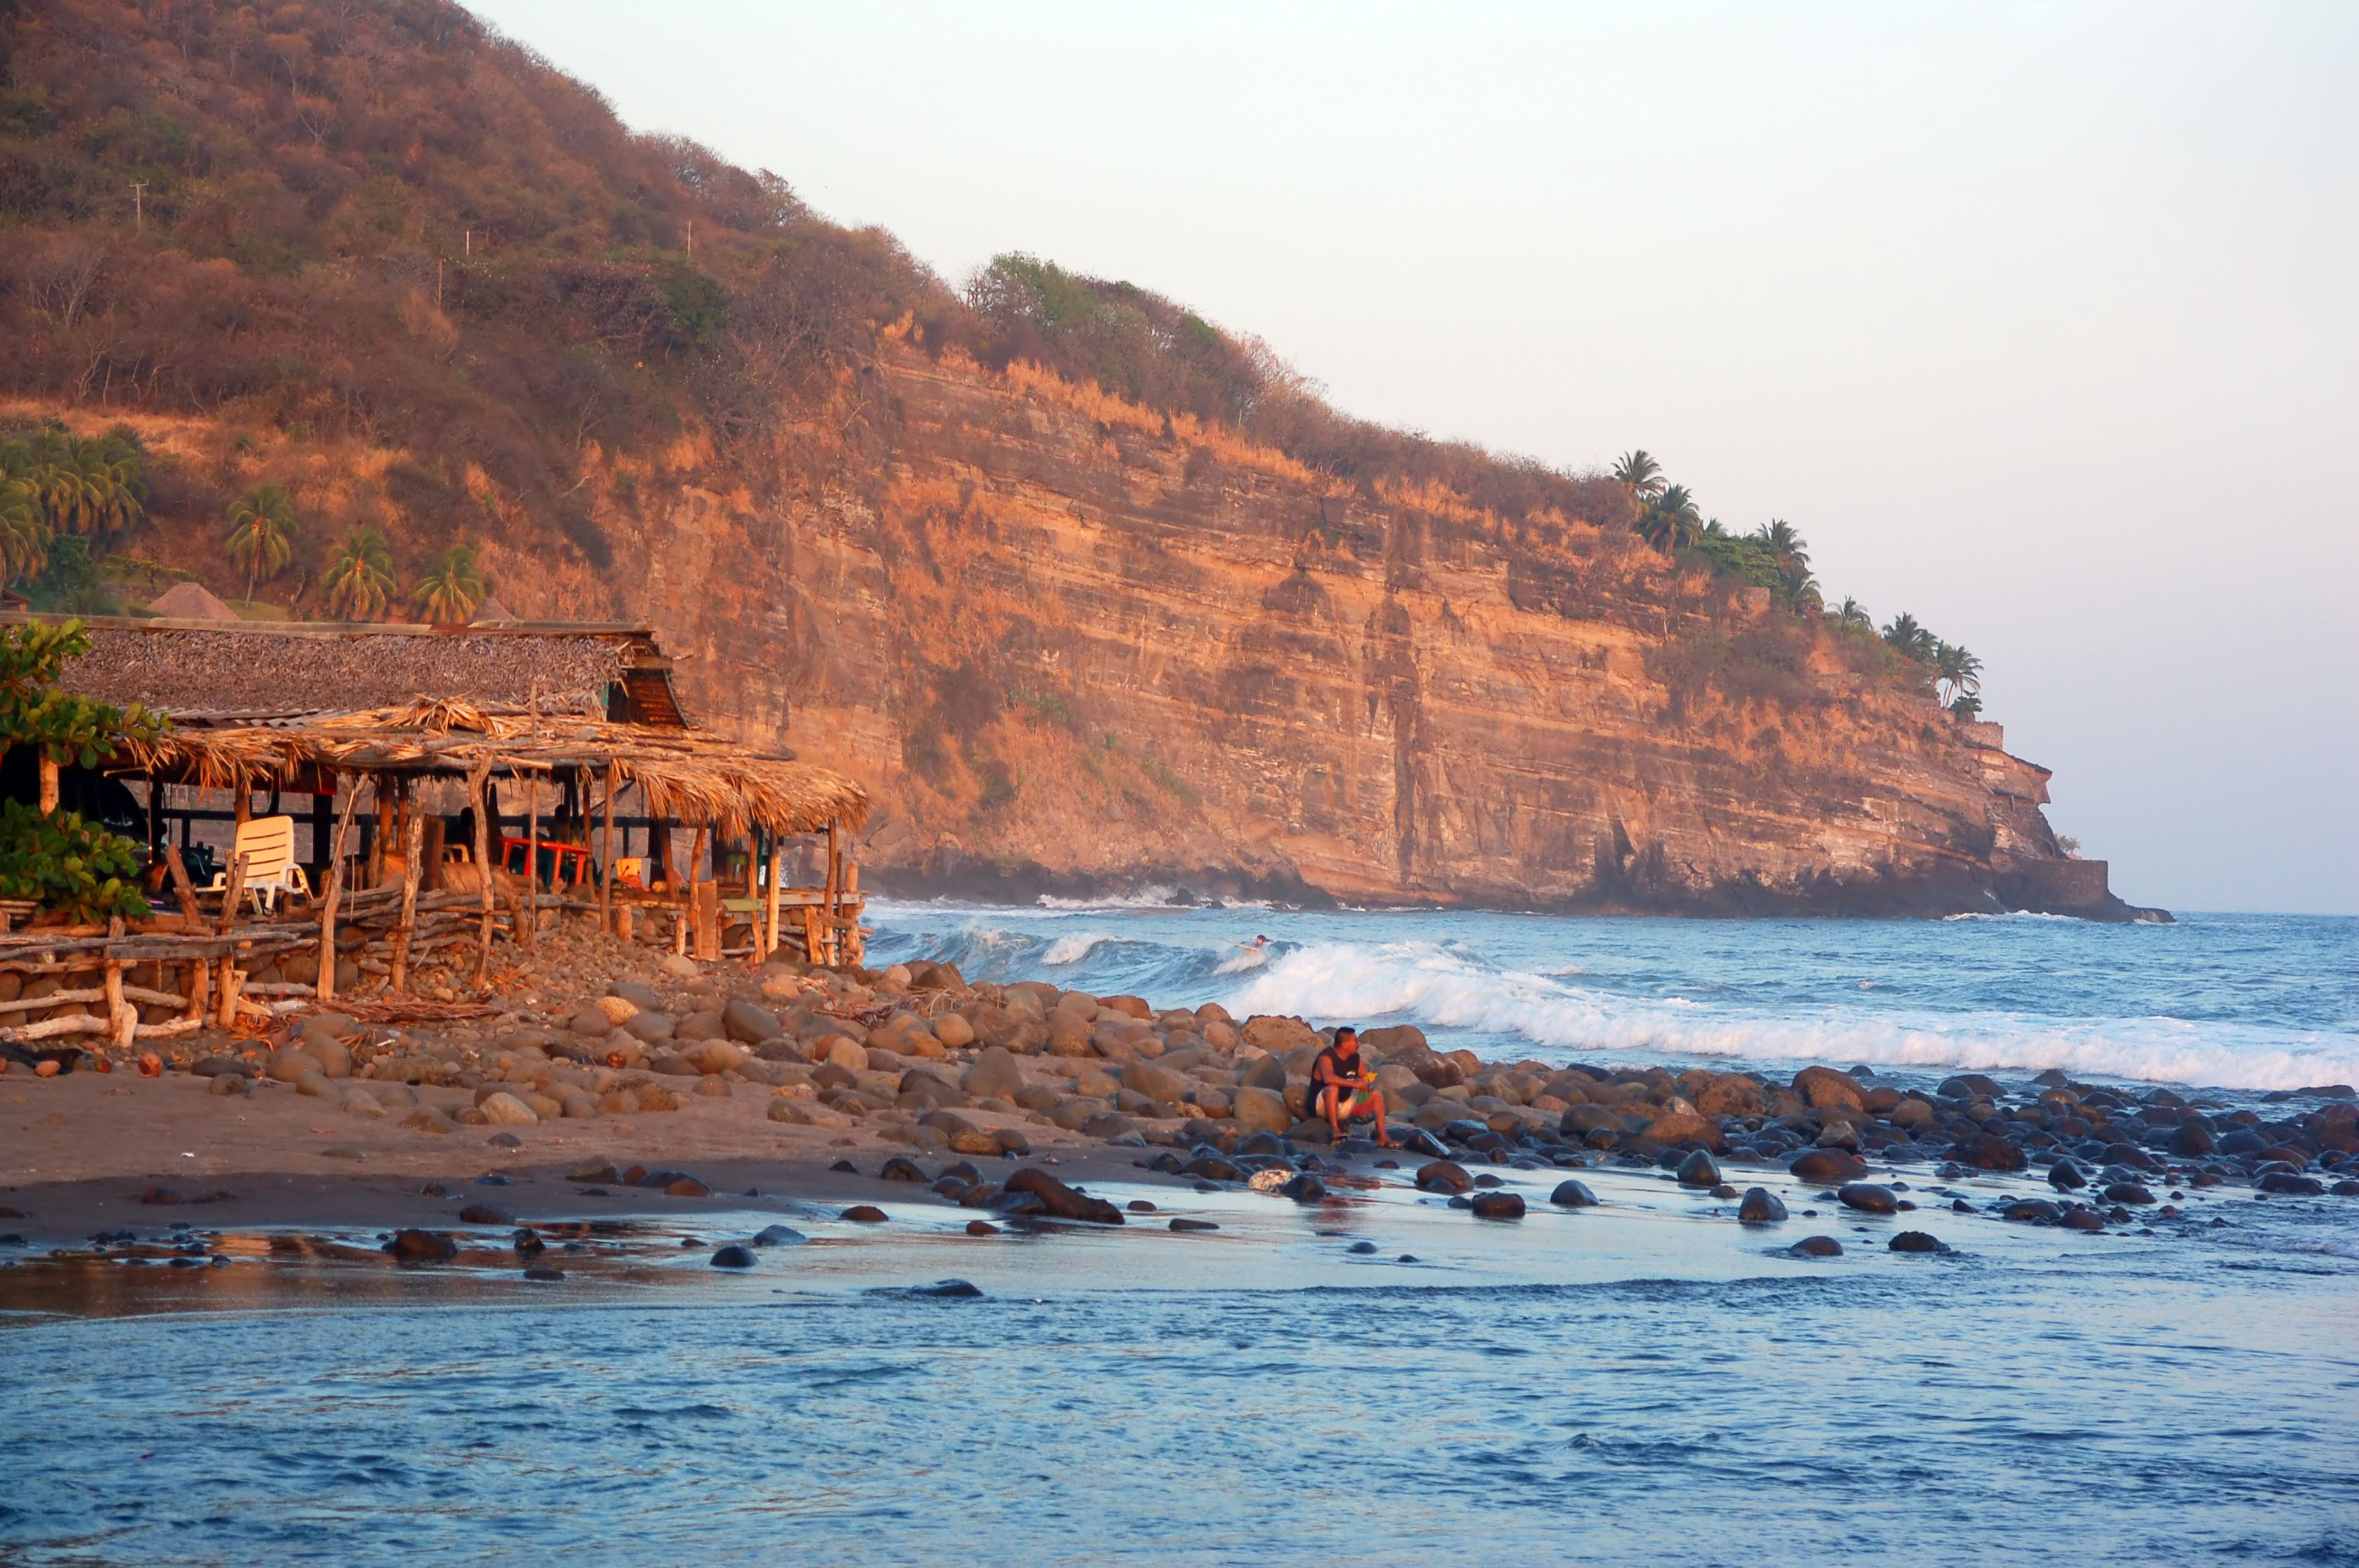 Man enjoying a peaceful afternoon on rocky beach of Playa El Zonte.